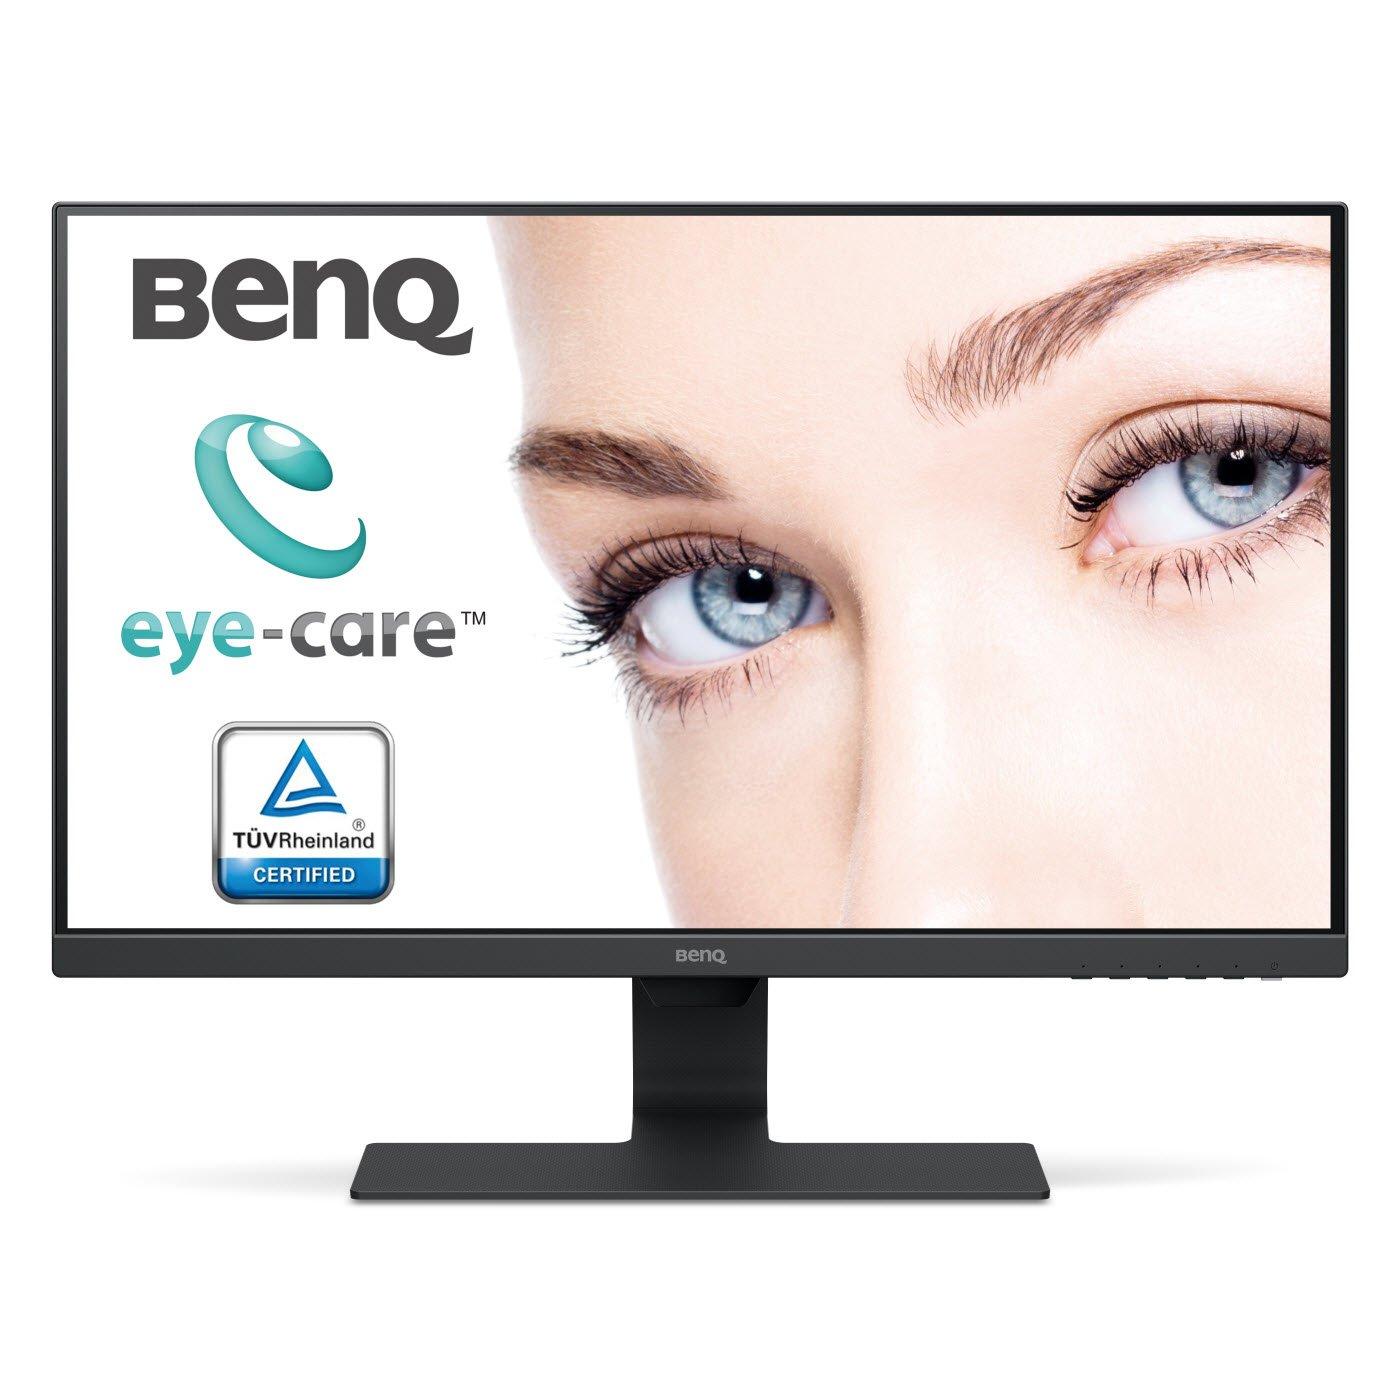 BenQ GW2780 27 Inch 1080p Eye Care LED IPS Monitor, Anti-Glare, HDMI, B.I. Sensor for Home Office £97.99 @ Amazon